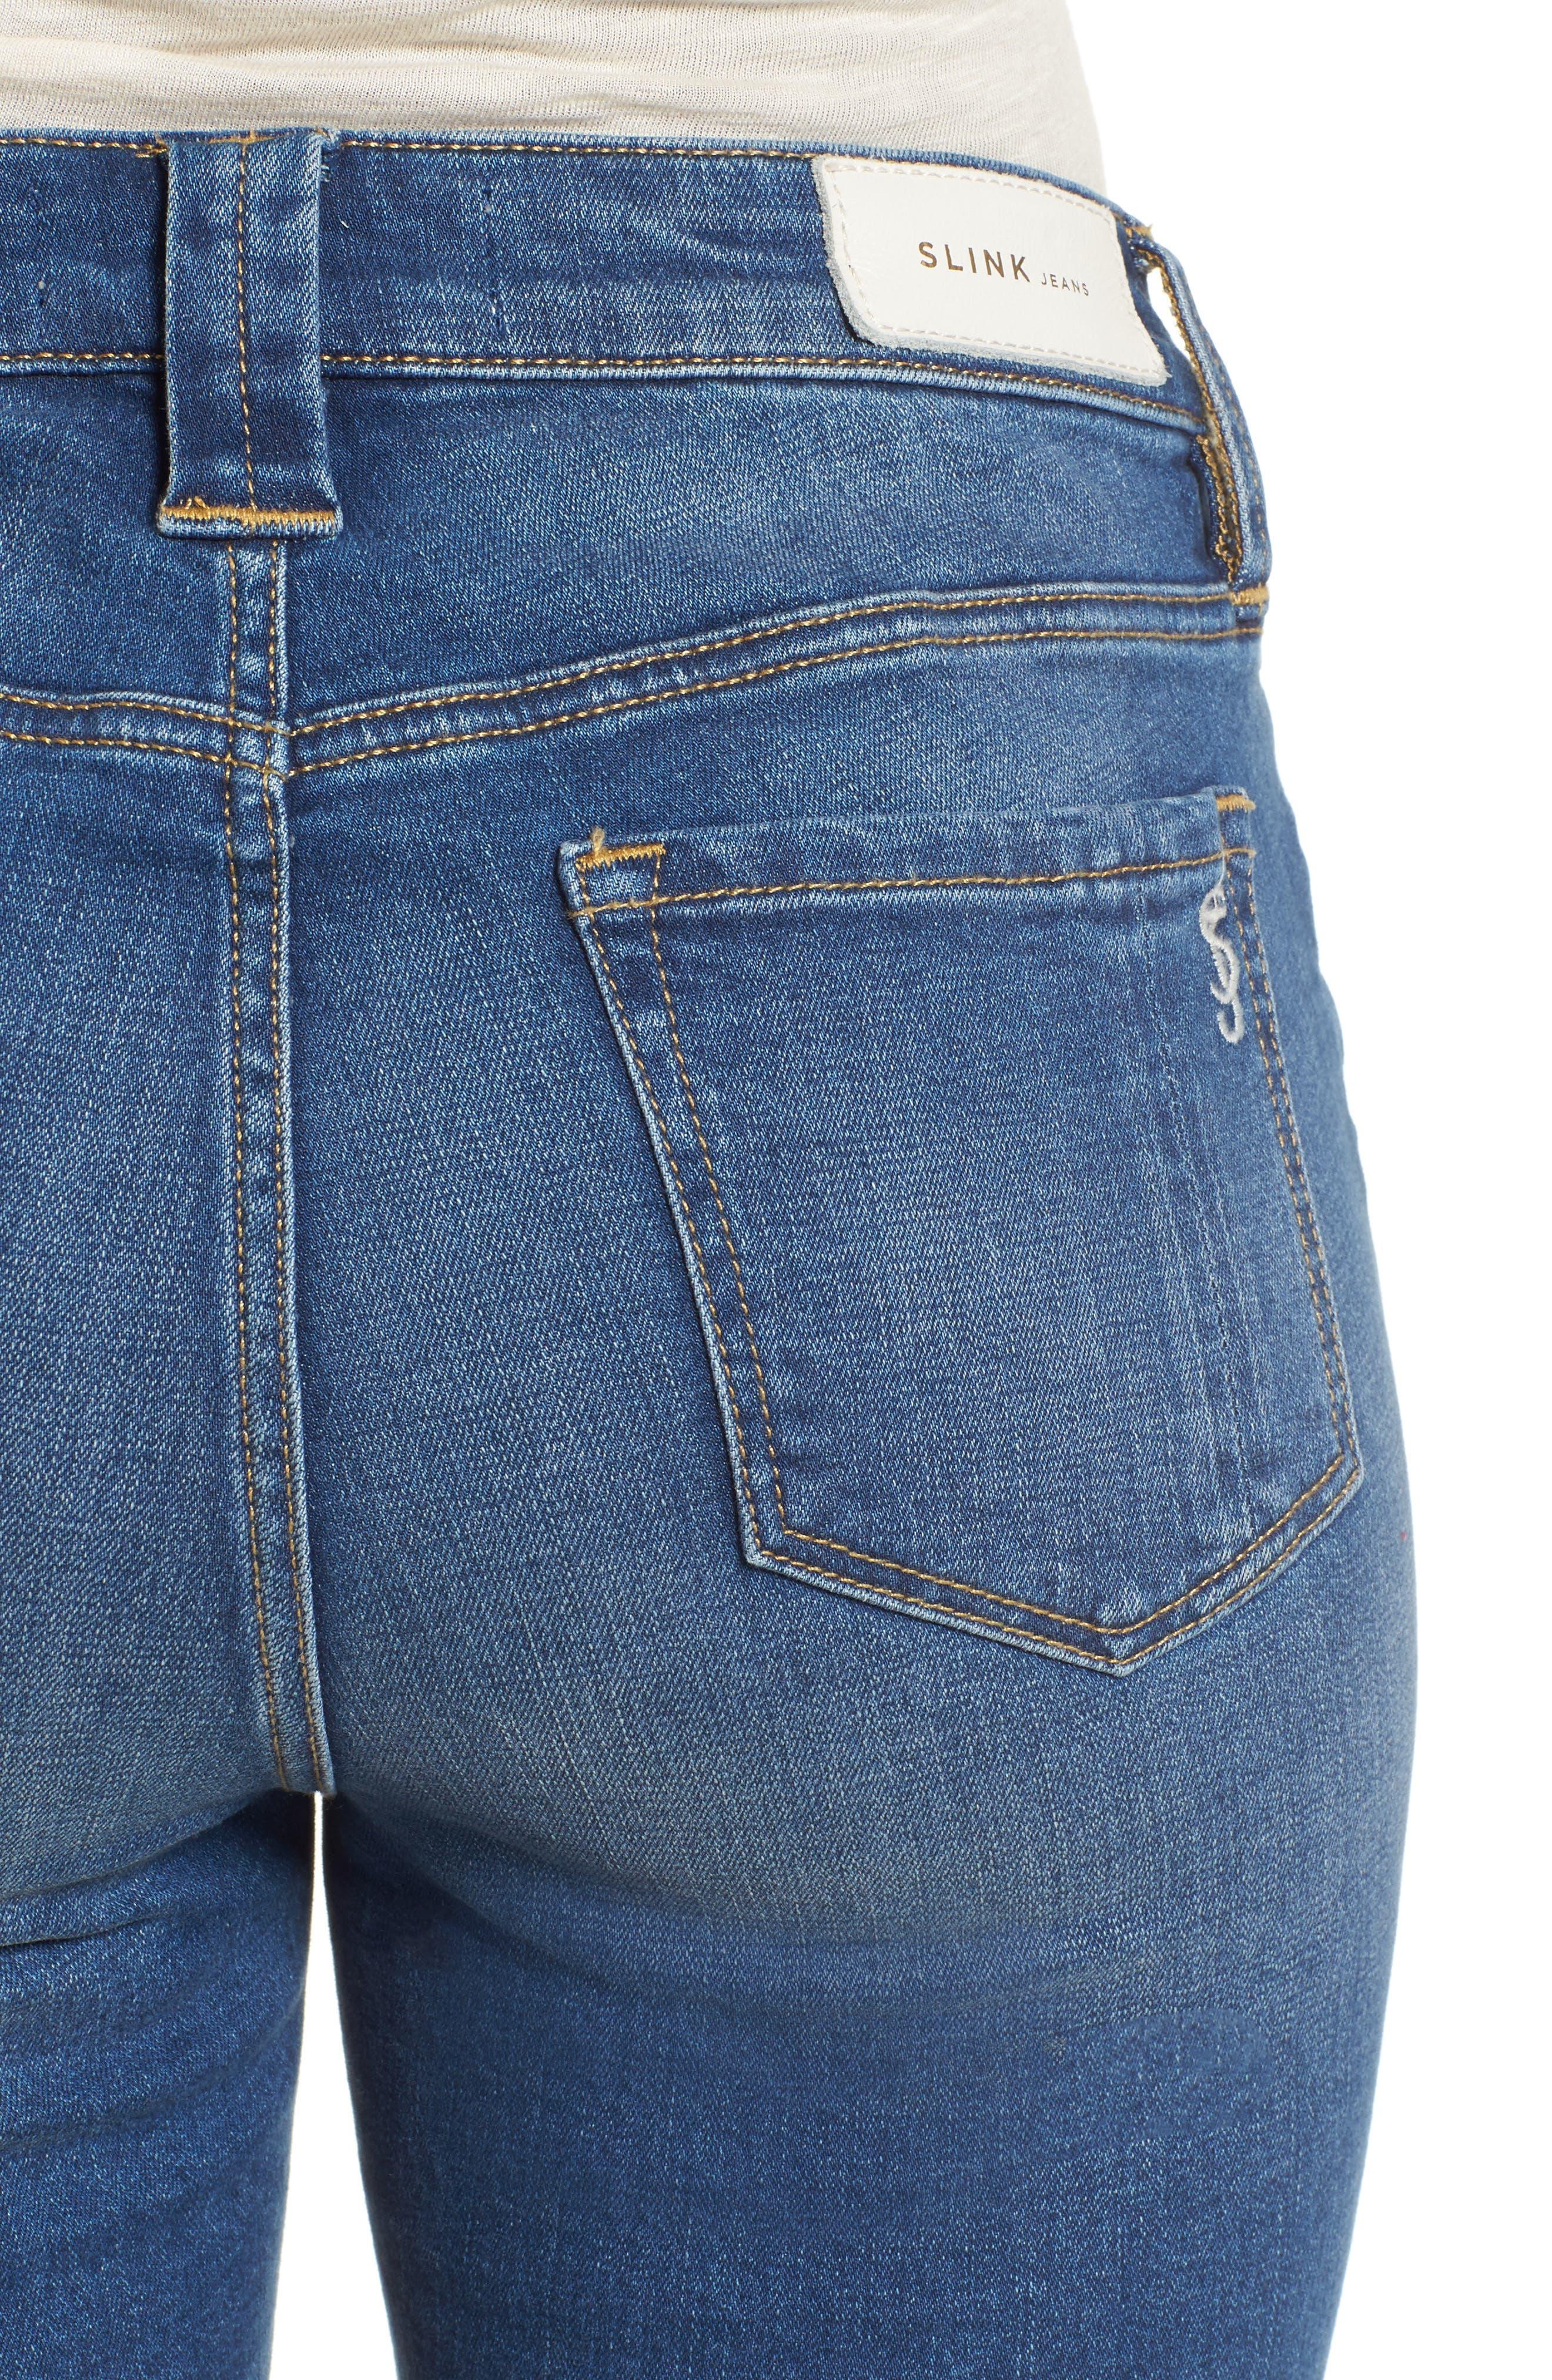 Bermuda Shorts,                             Alternate thumbnail 4, color,                             BIRDY